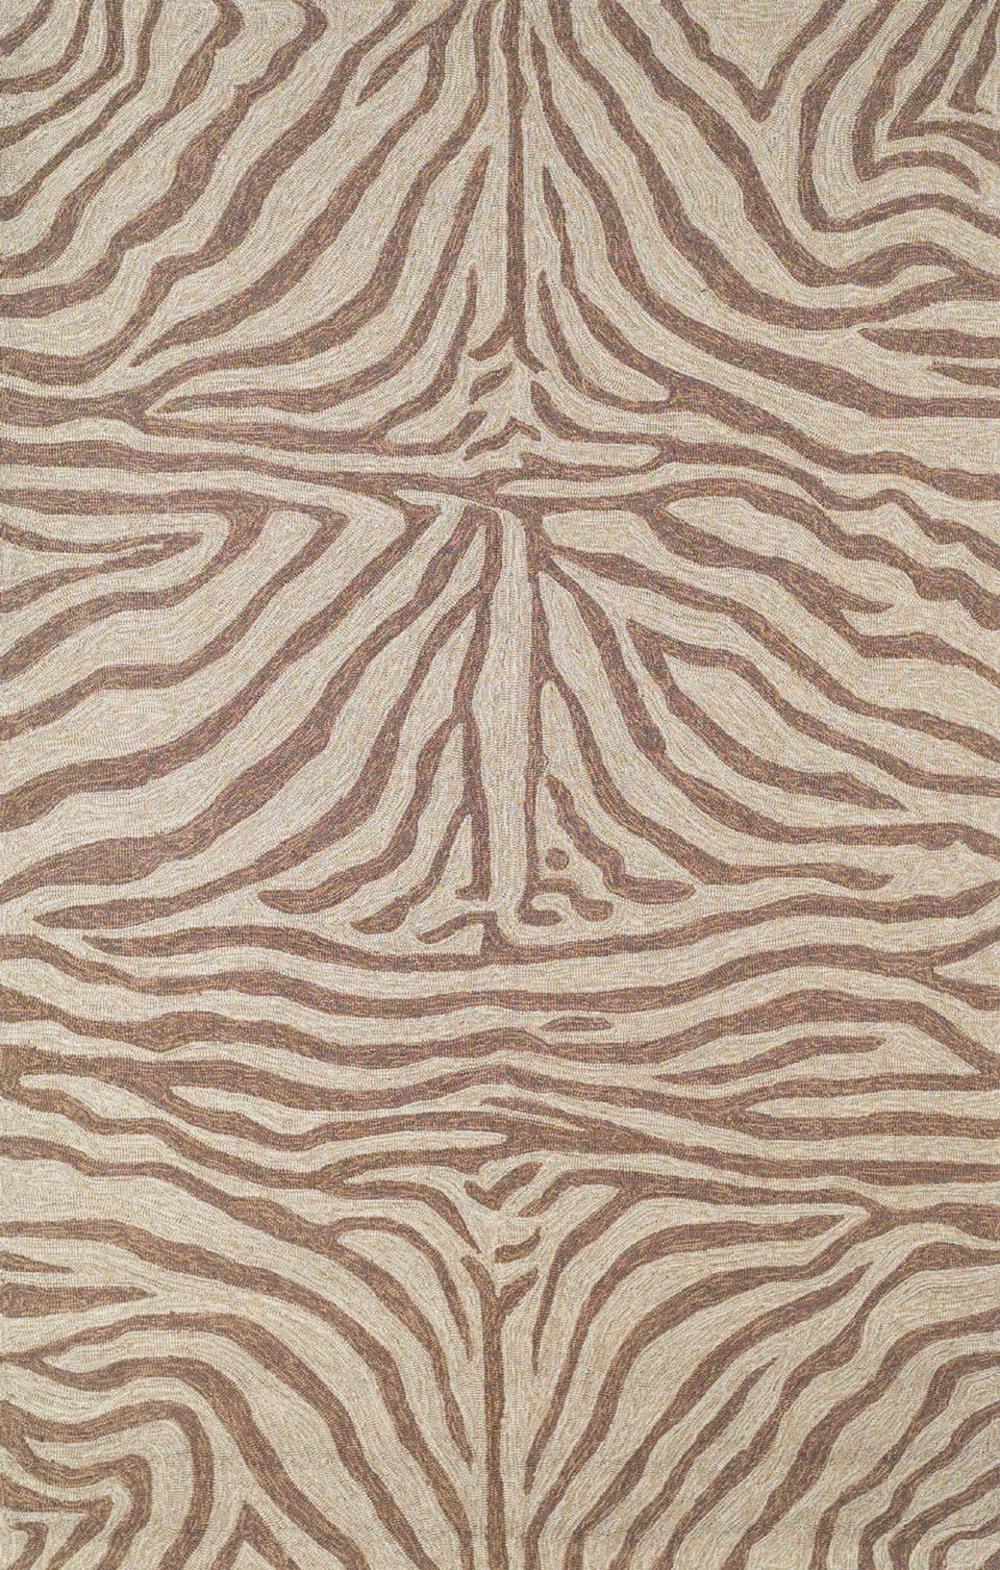 Trans-Ocean Import - Ravella Zebra Brown Rug, 5'x8'